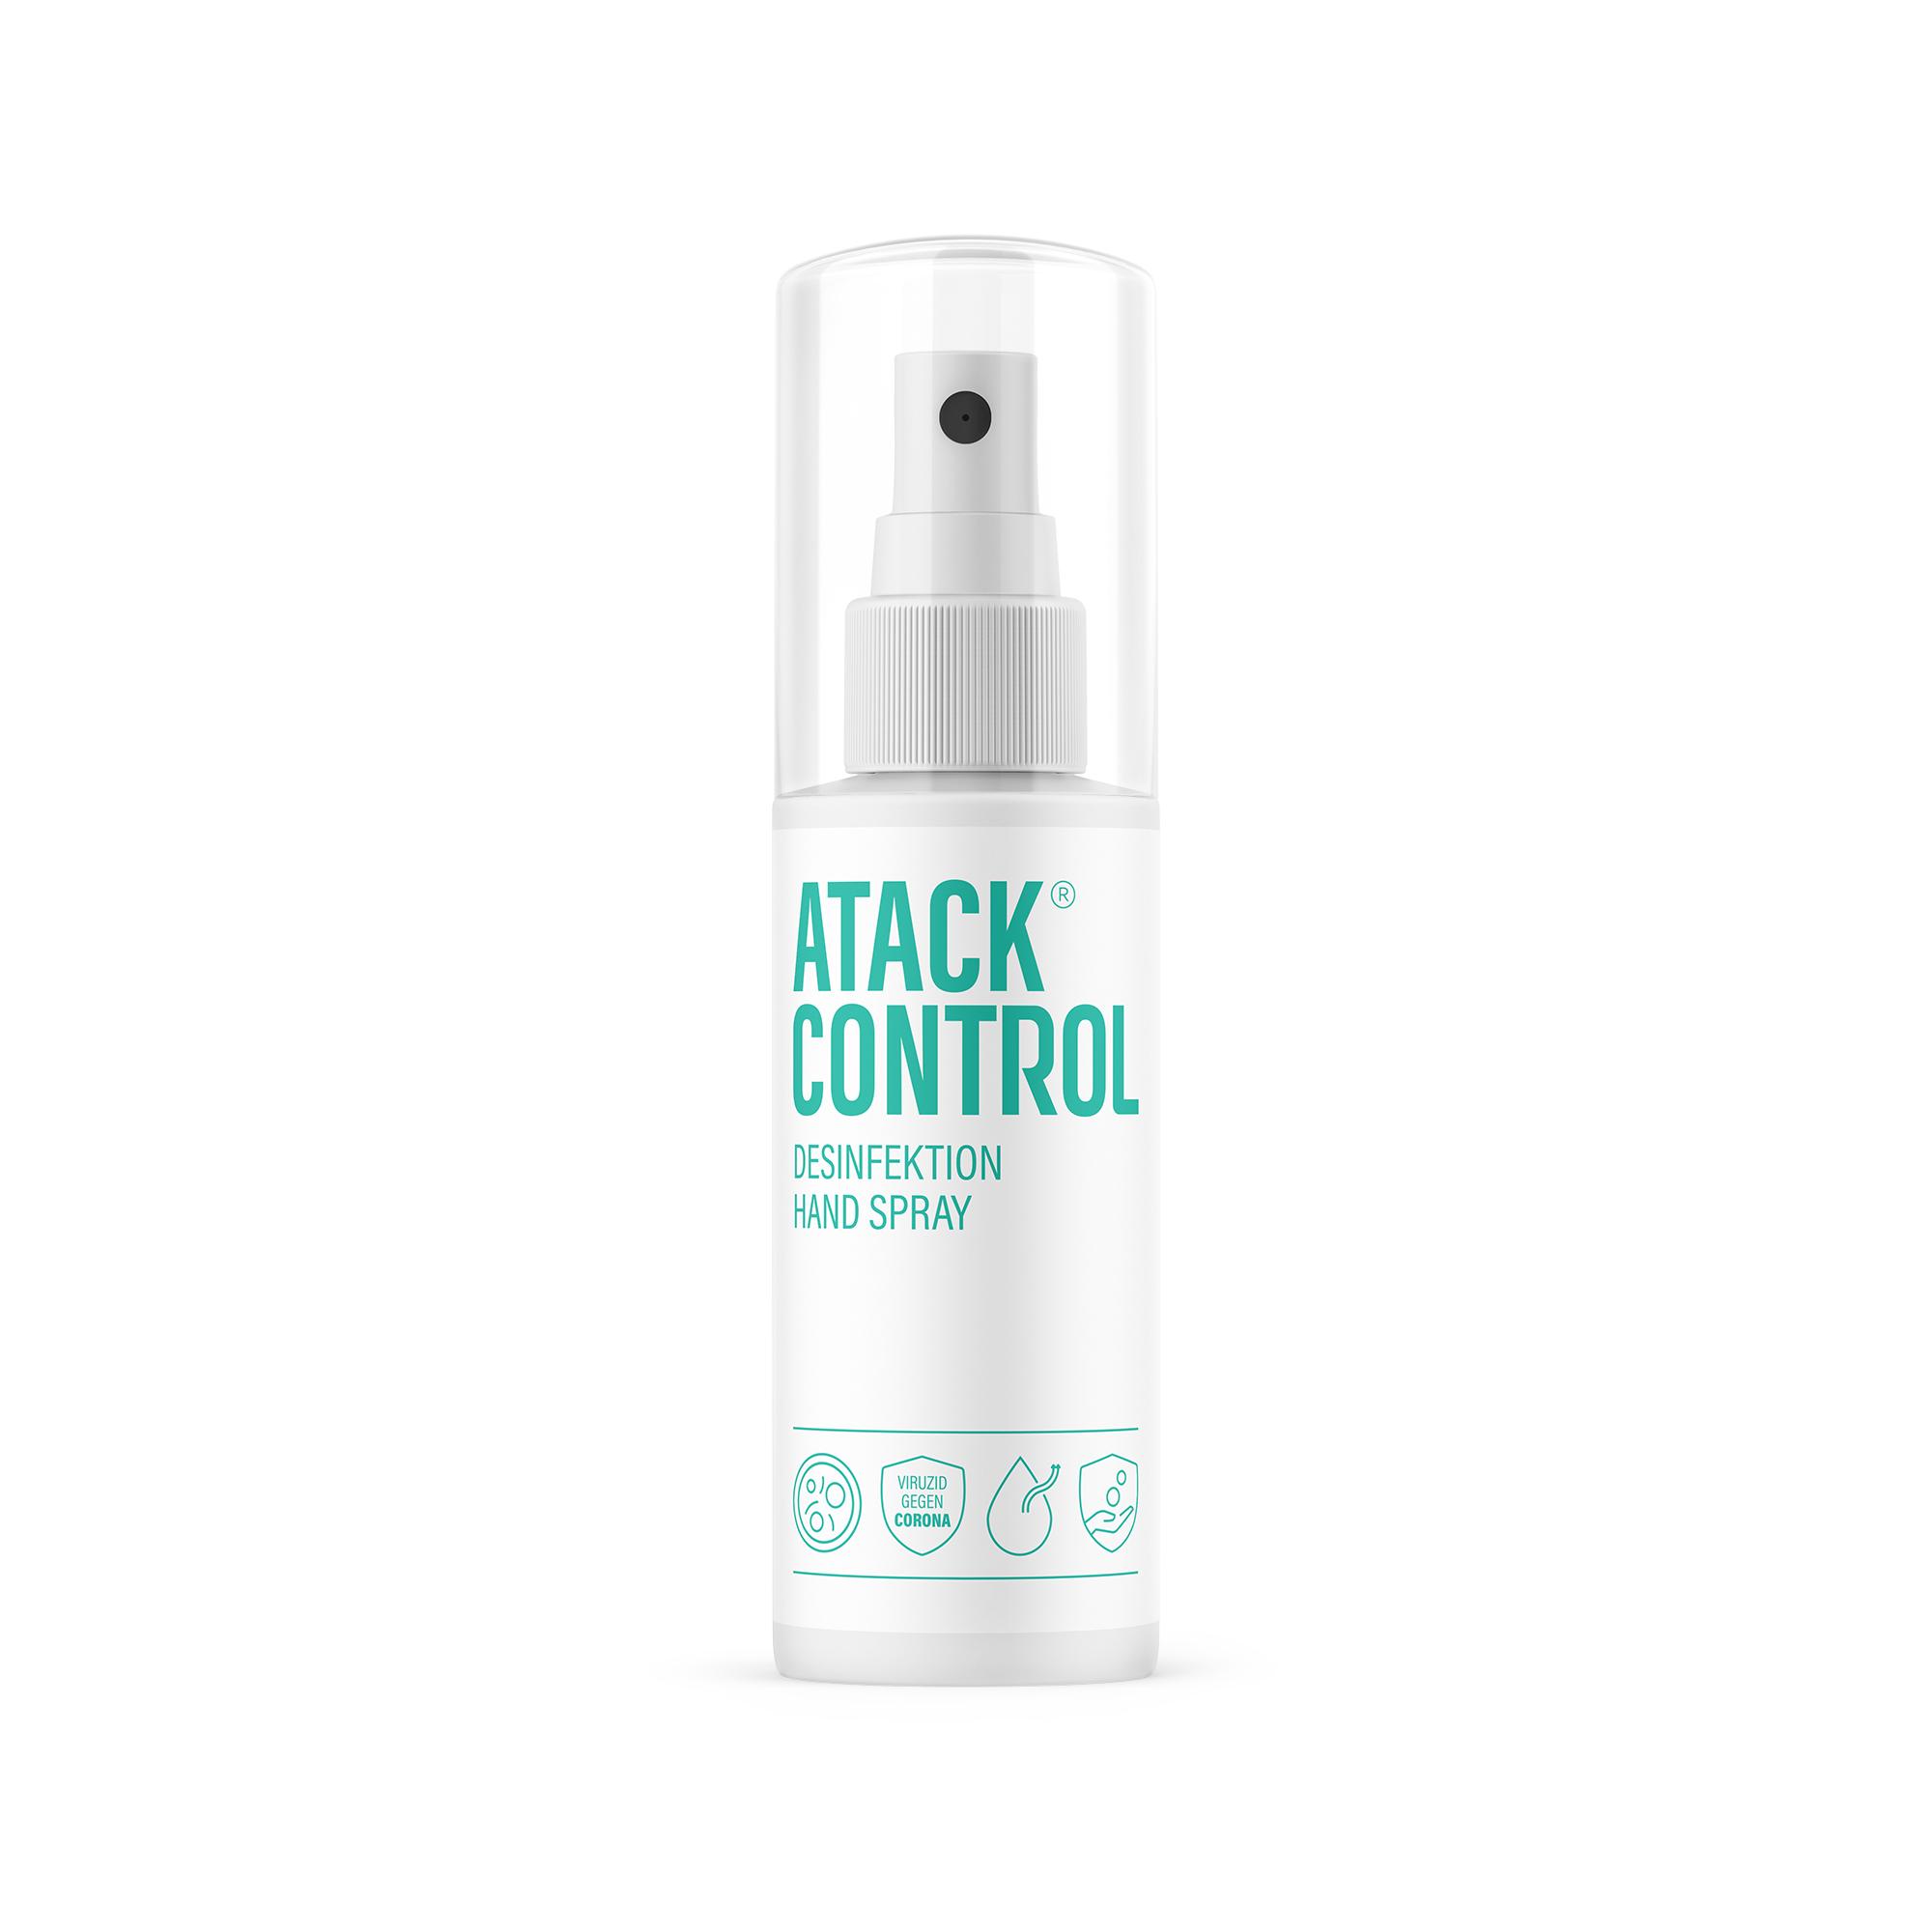 Atack Control Desinfektion Hanspray